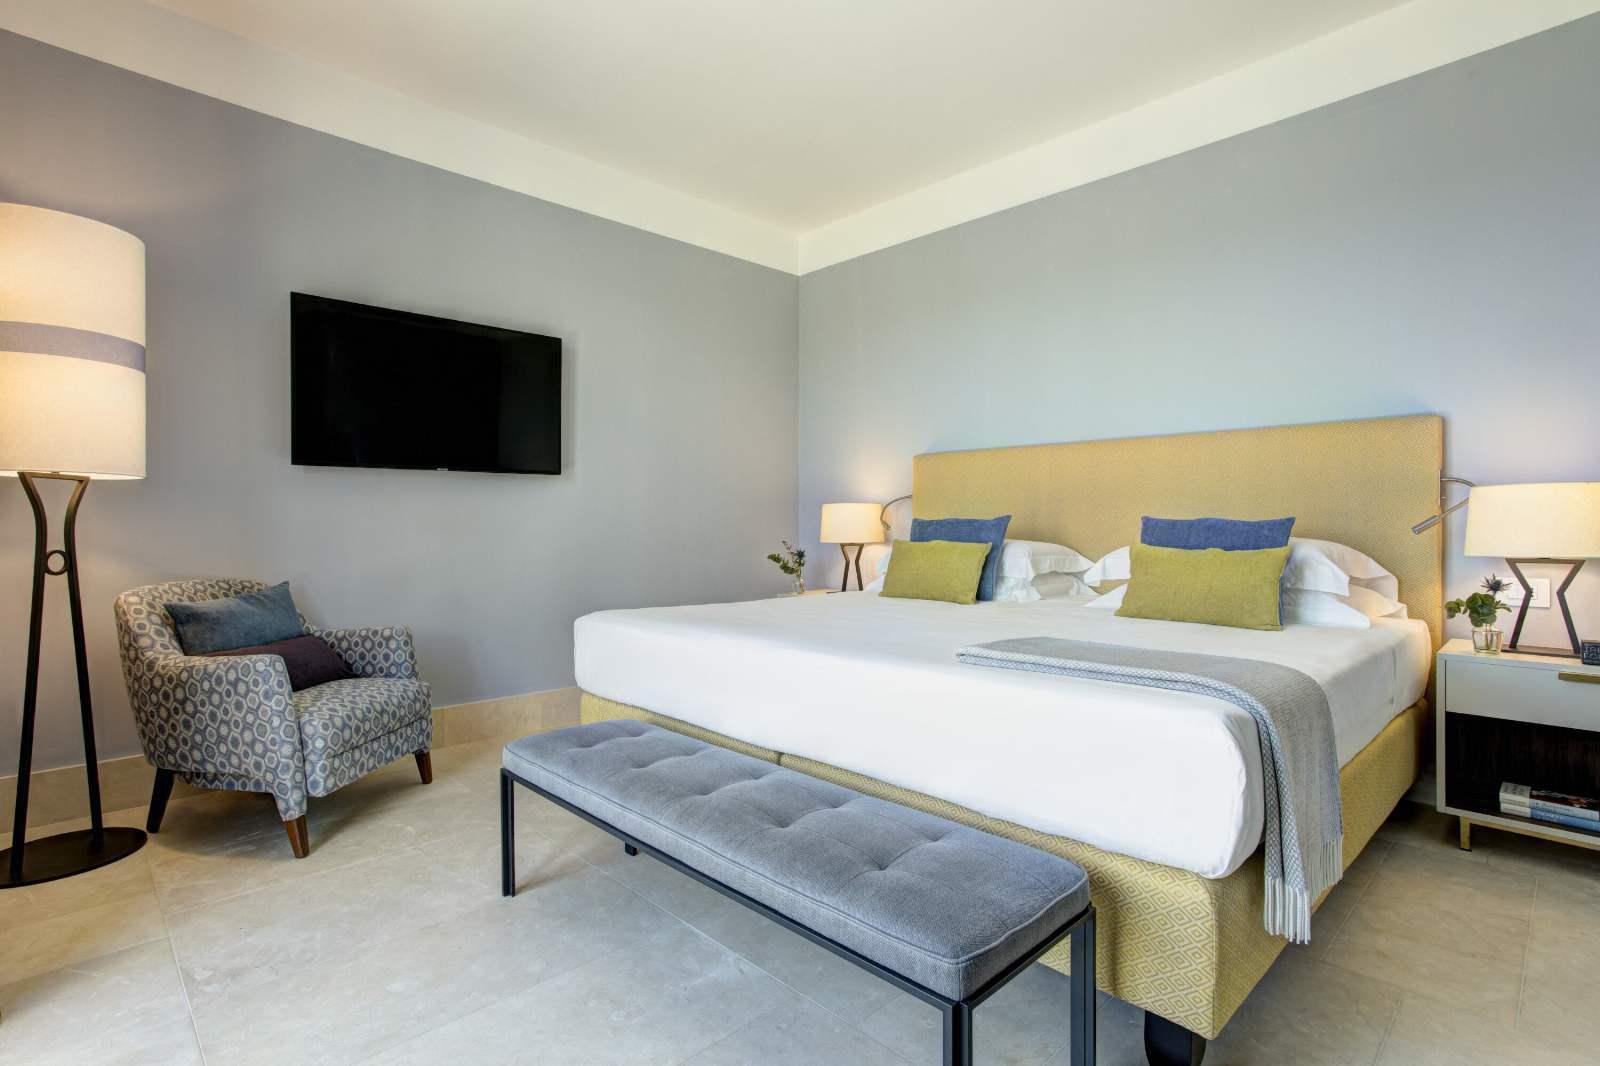 Verdura Resort: Private Villas: room / property / locale photo. Image 11